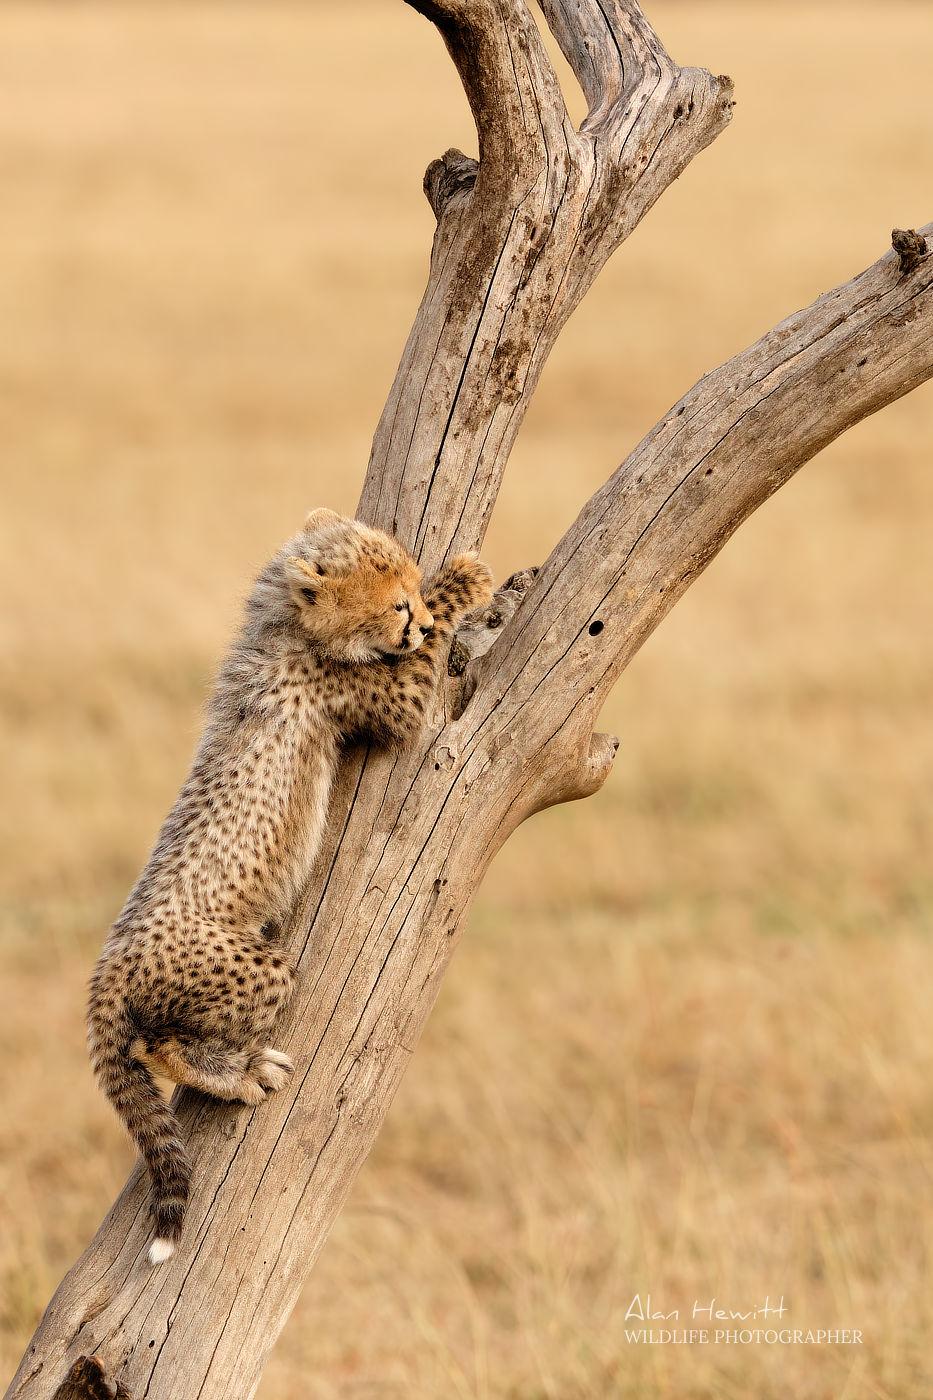 Cheetah Cub Maasai Mara African Photography Safari Alan Hewitt